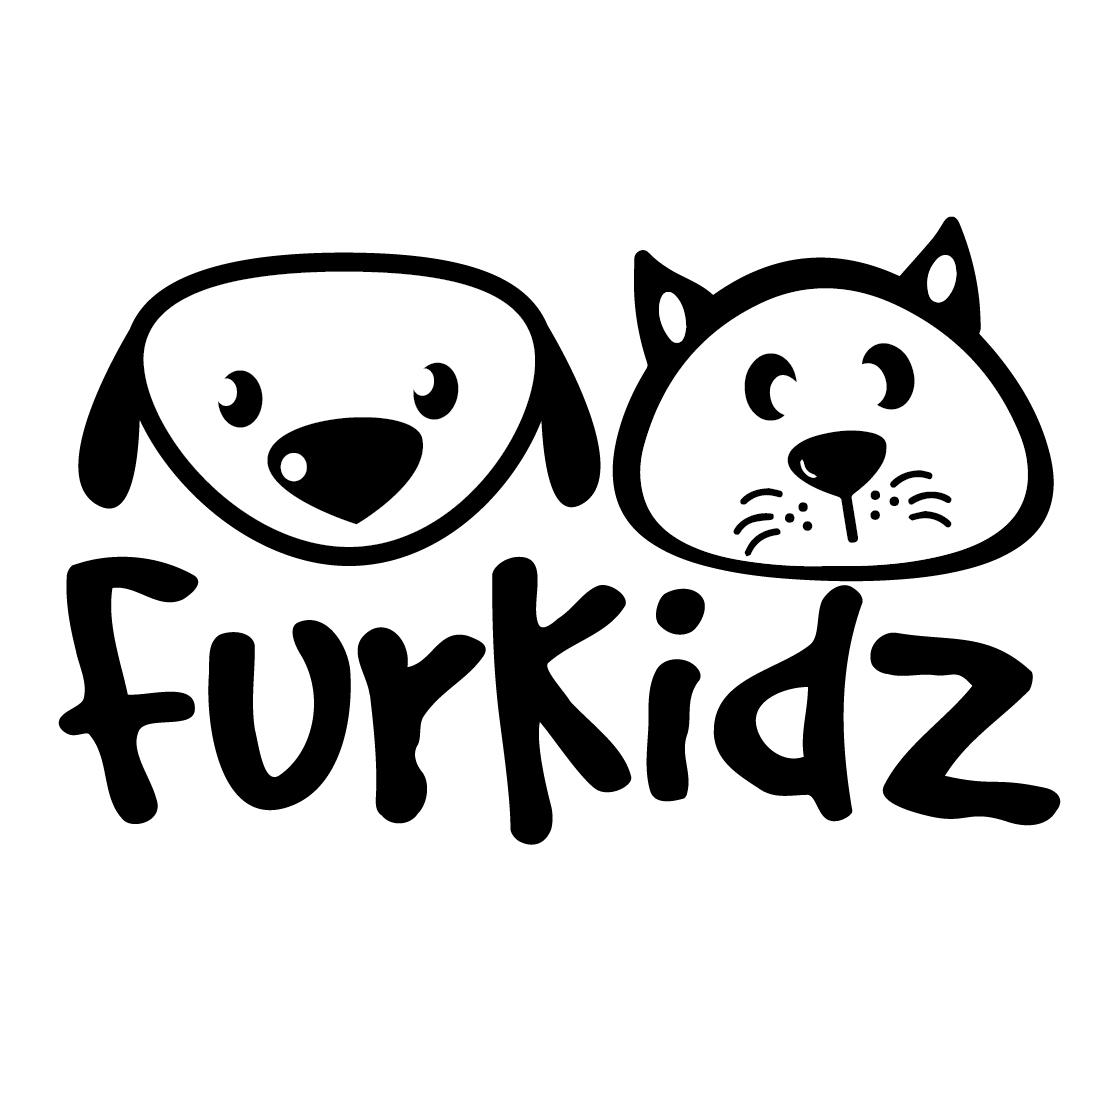 FurKidz